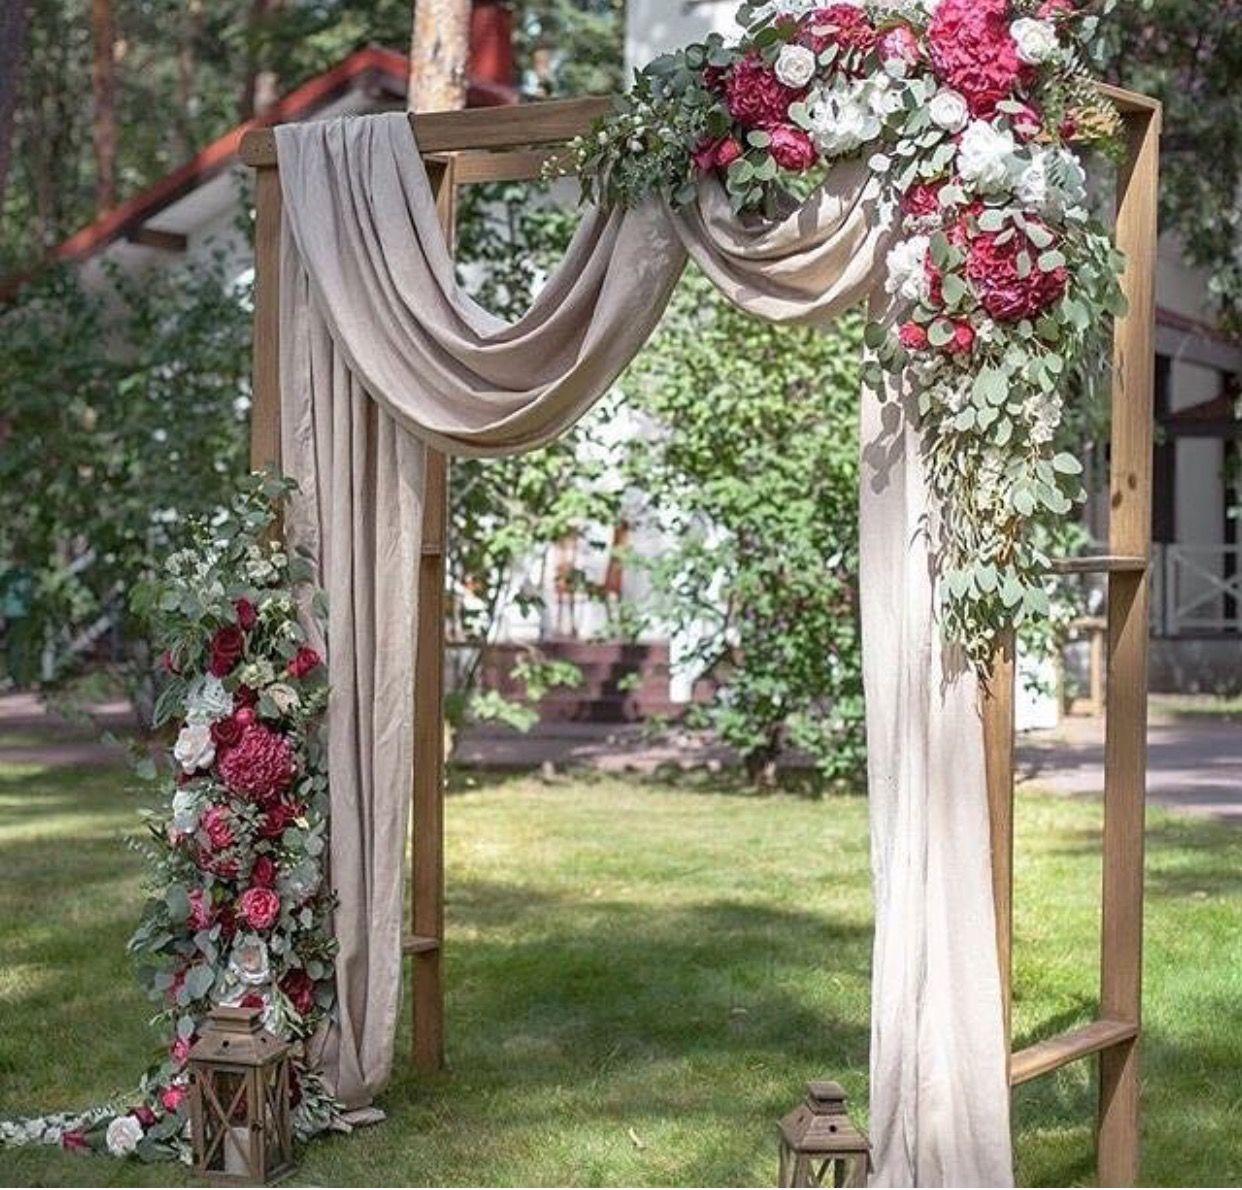 24 Outdoor Wedding Decoration Ideas: Pin By Adrienne Altobelli On Top Wedding Picks